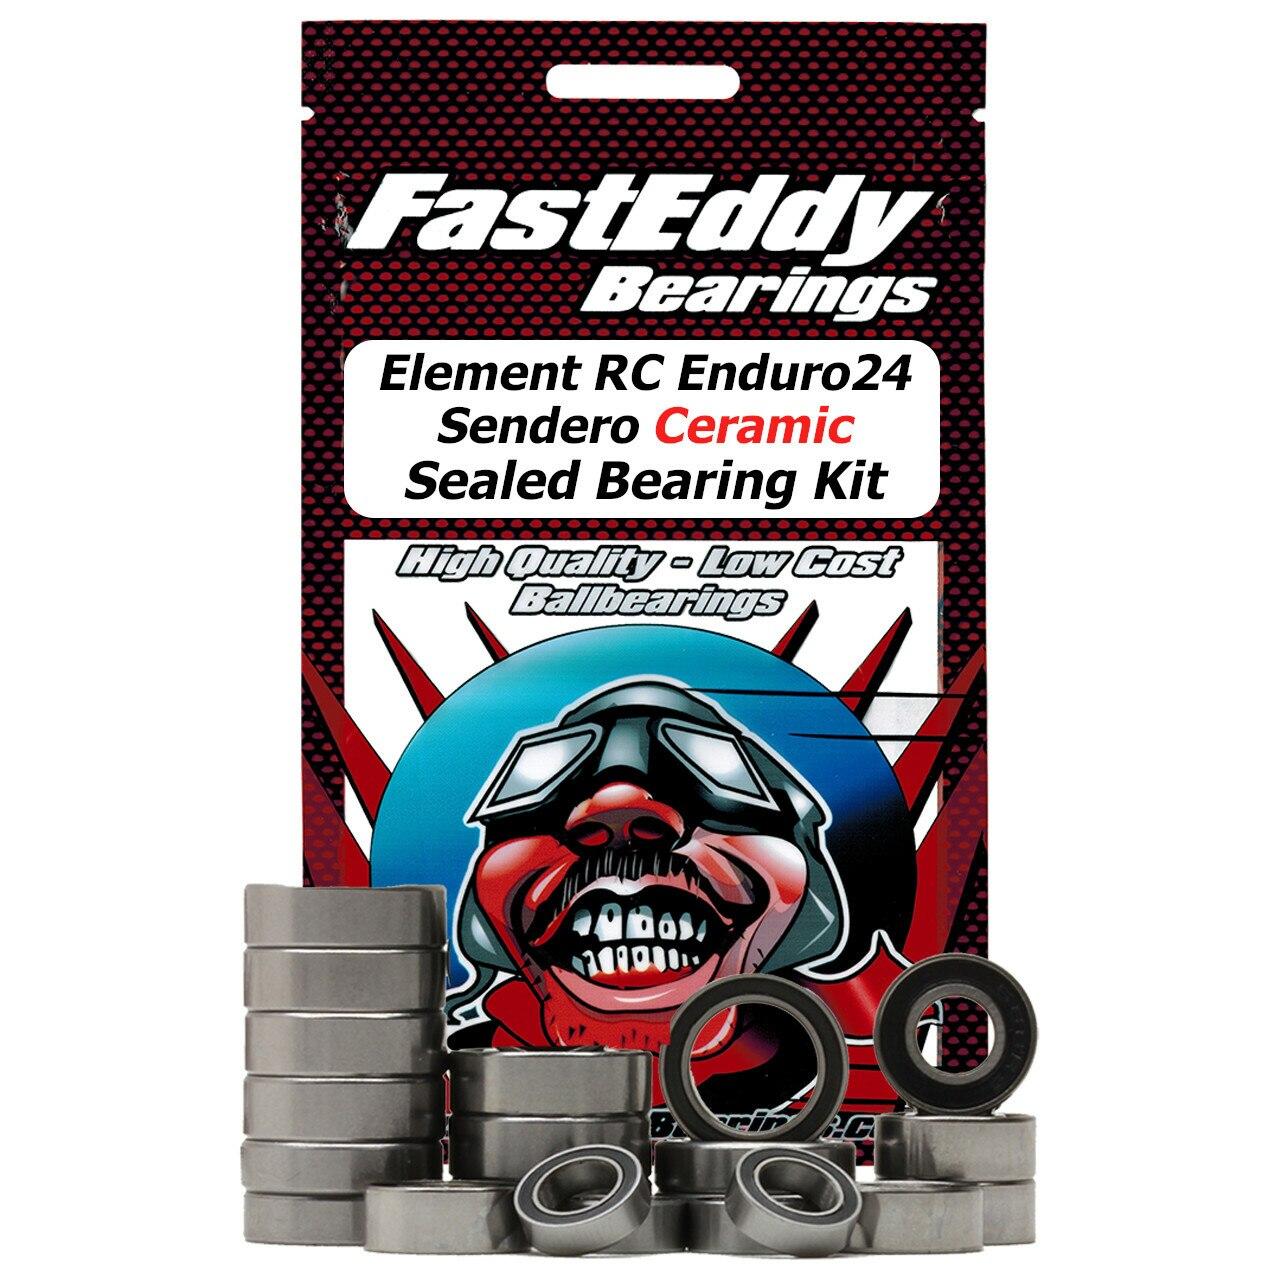 Element RC Enduro24 Sendero Ceramic Sealed Bearing Kit TFE6336